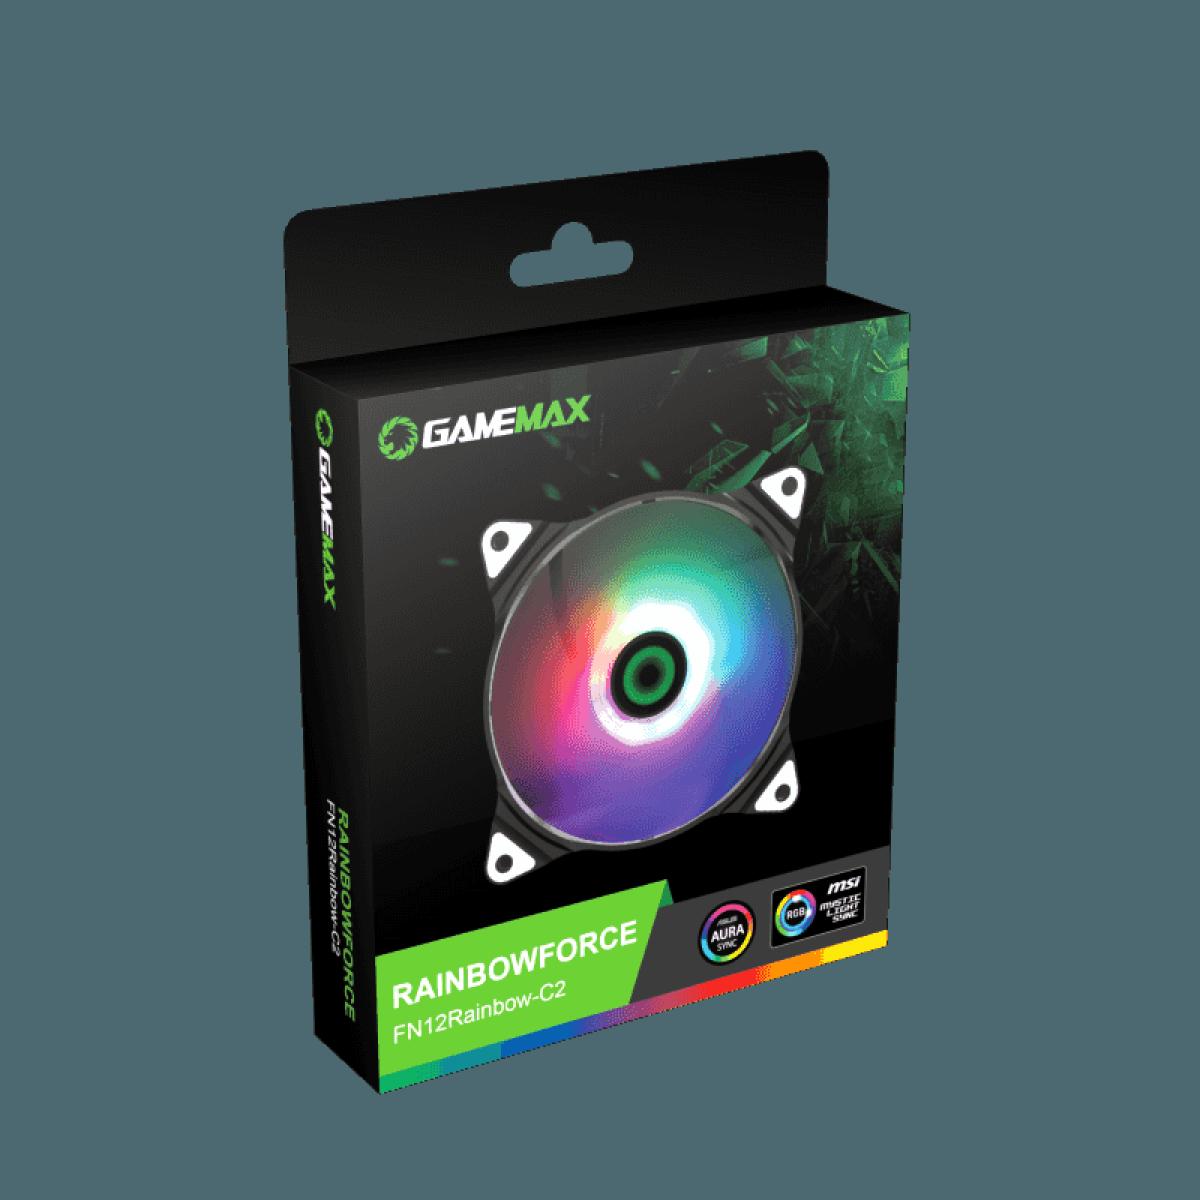 Cooler Para Gabinete Gamemax Force Rainbow C2, ARGB 120mm, FN-12RAINBOW-C2